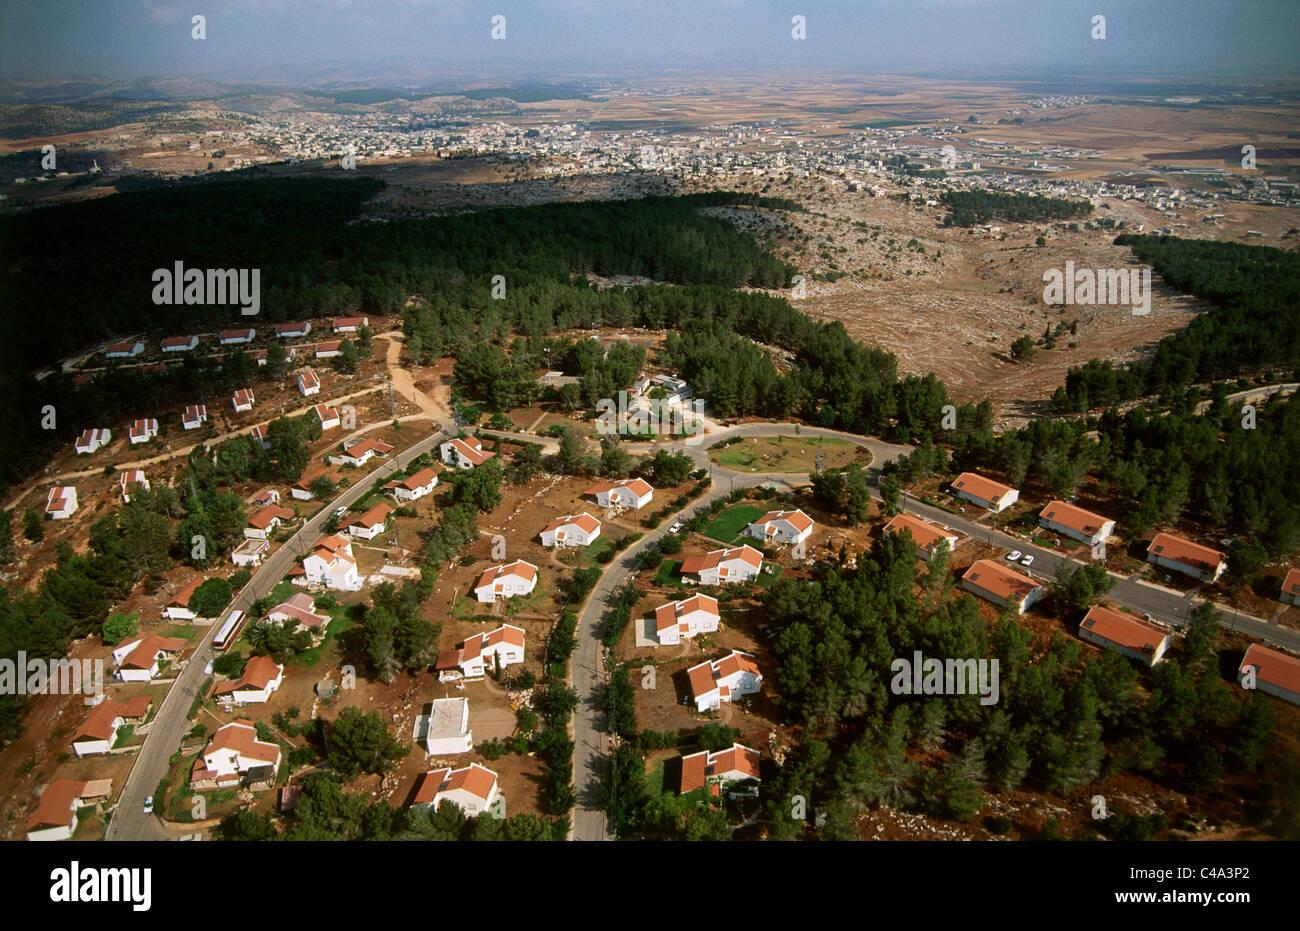 Aerial photograph of the Israeli Settlement of Kadim in Samaria - Stock Image